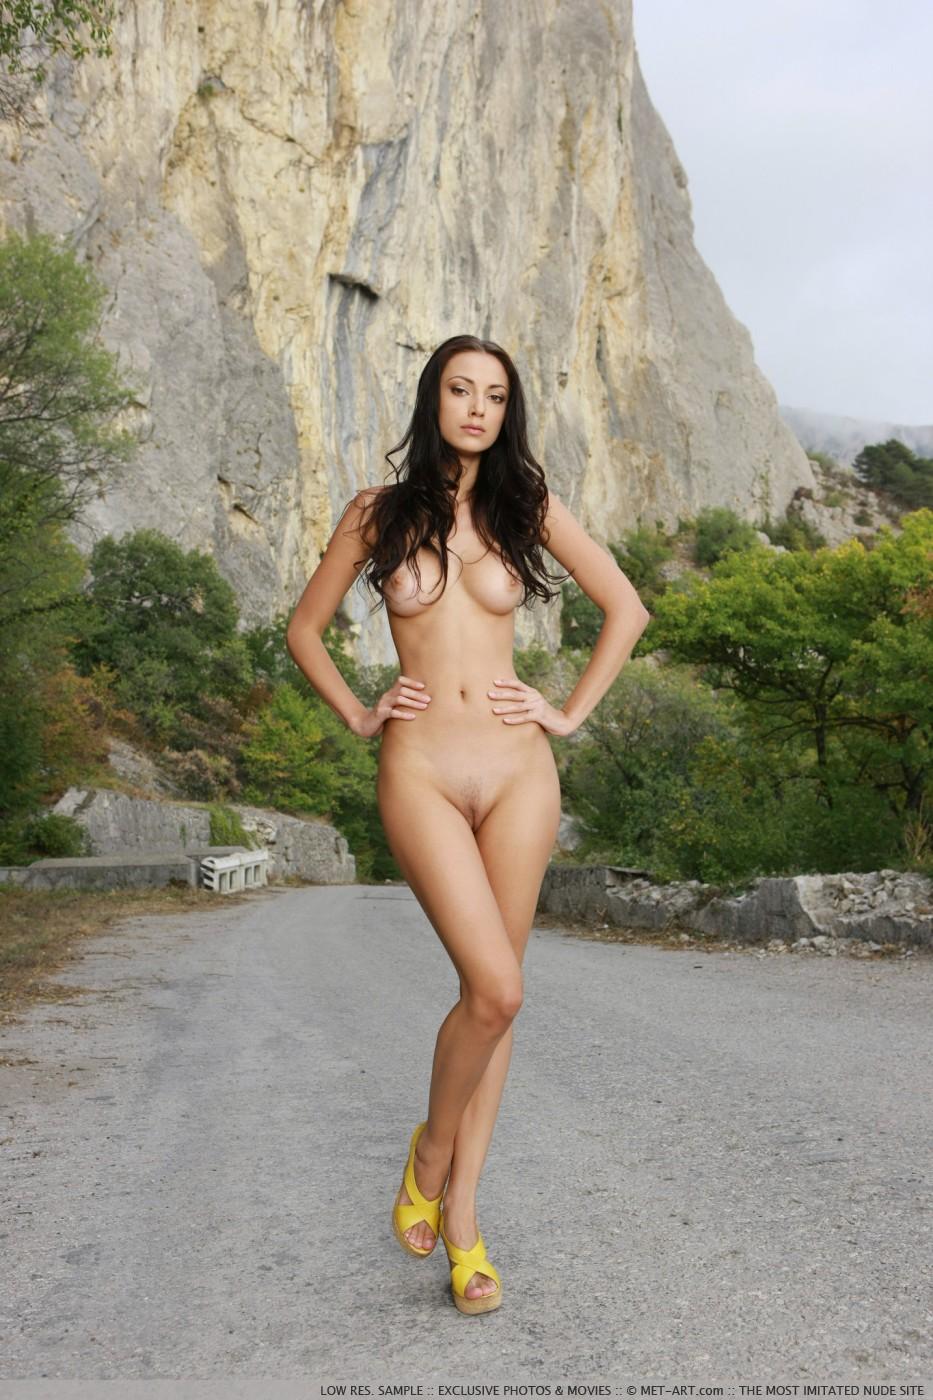 Anna K Art Nude Modelling Image